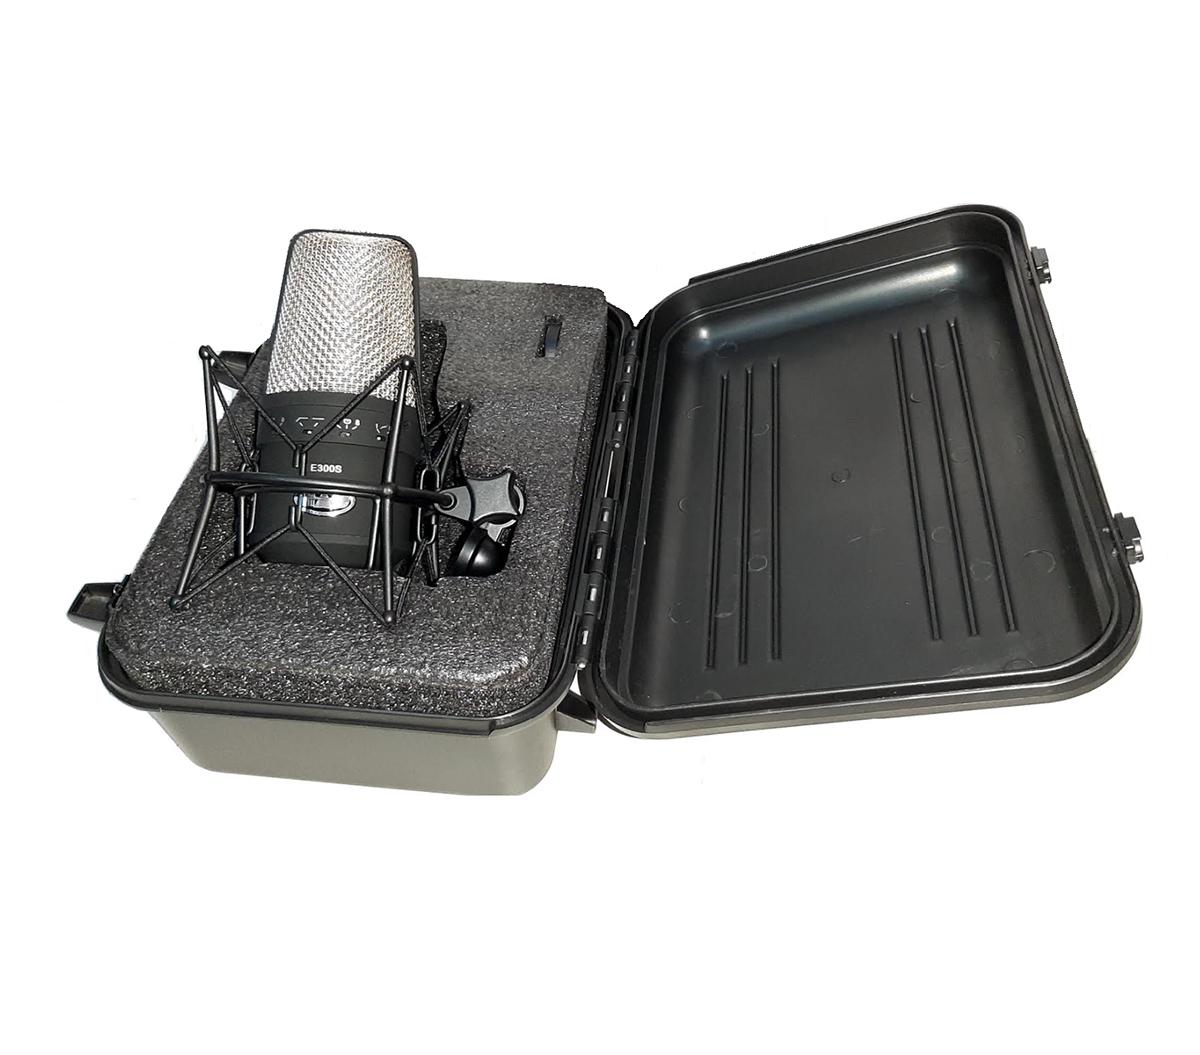 MICROFONE CONDENSER CAD EQUITEK E300S